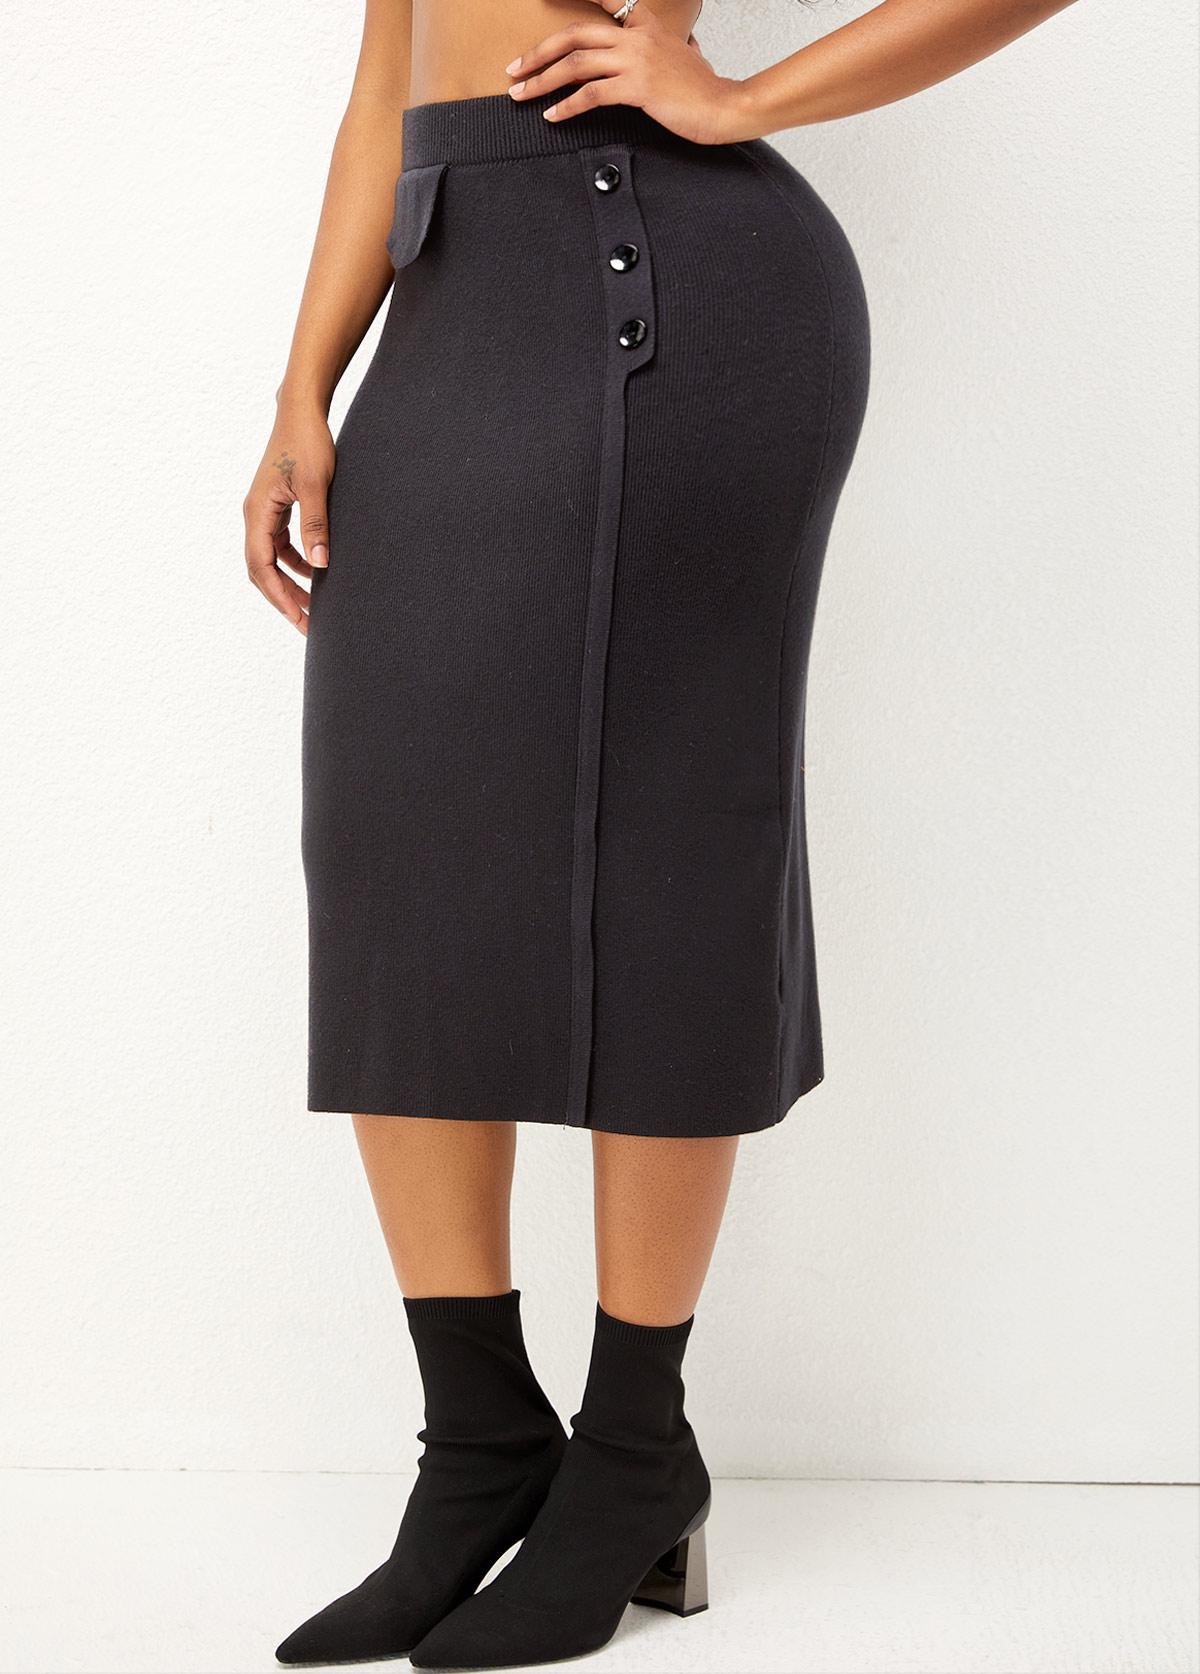 ROTITA High Waist Decorative Button Solid Skirt